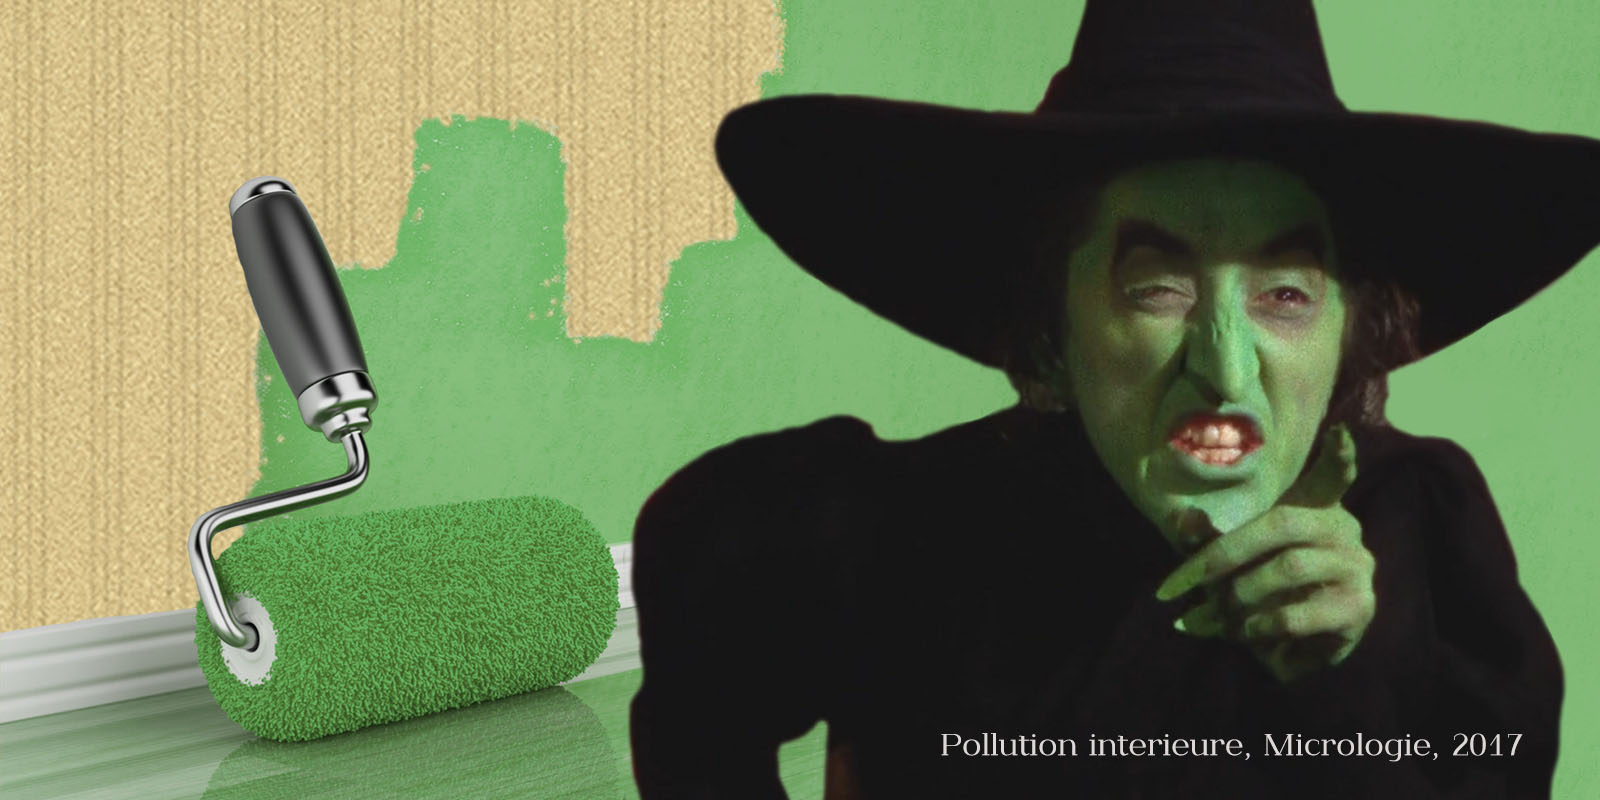 pollution intérieure, COV, micrologie